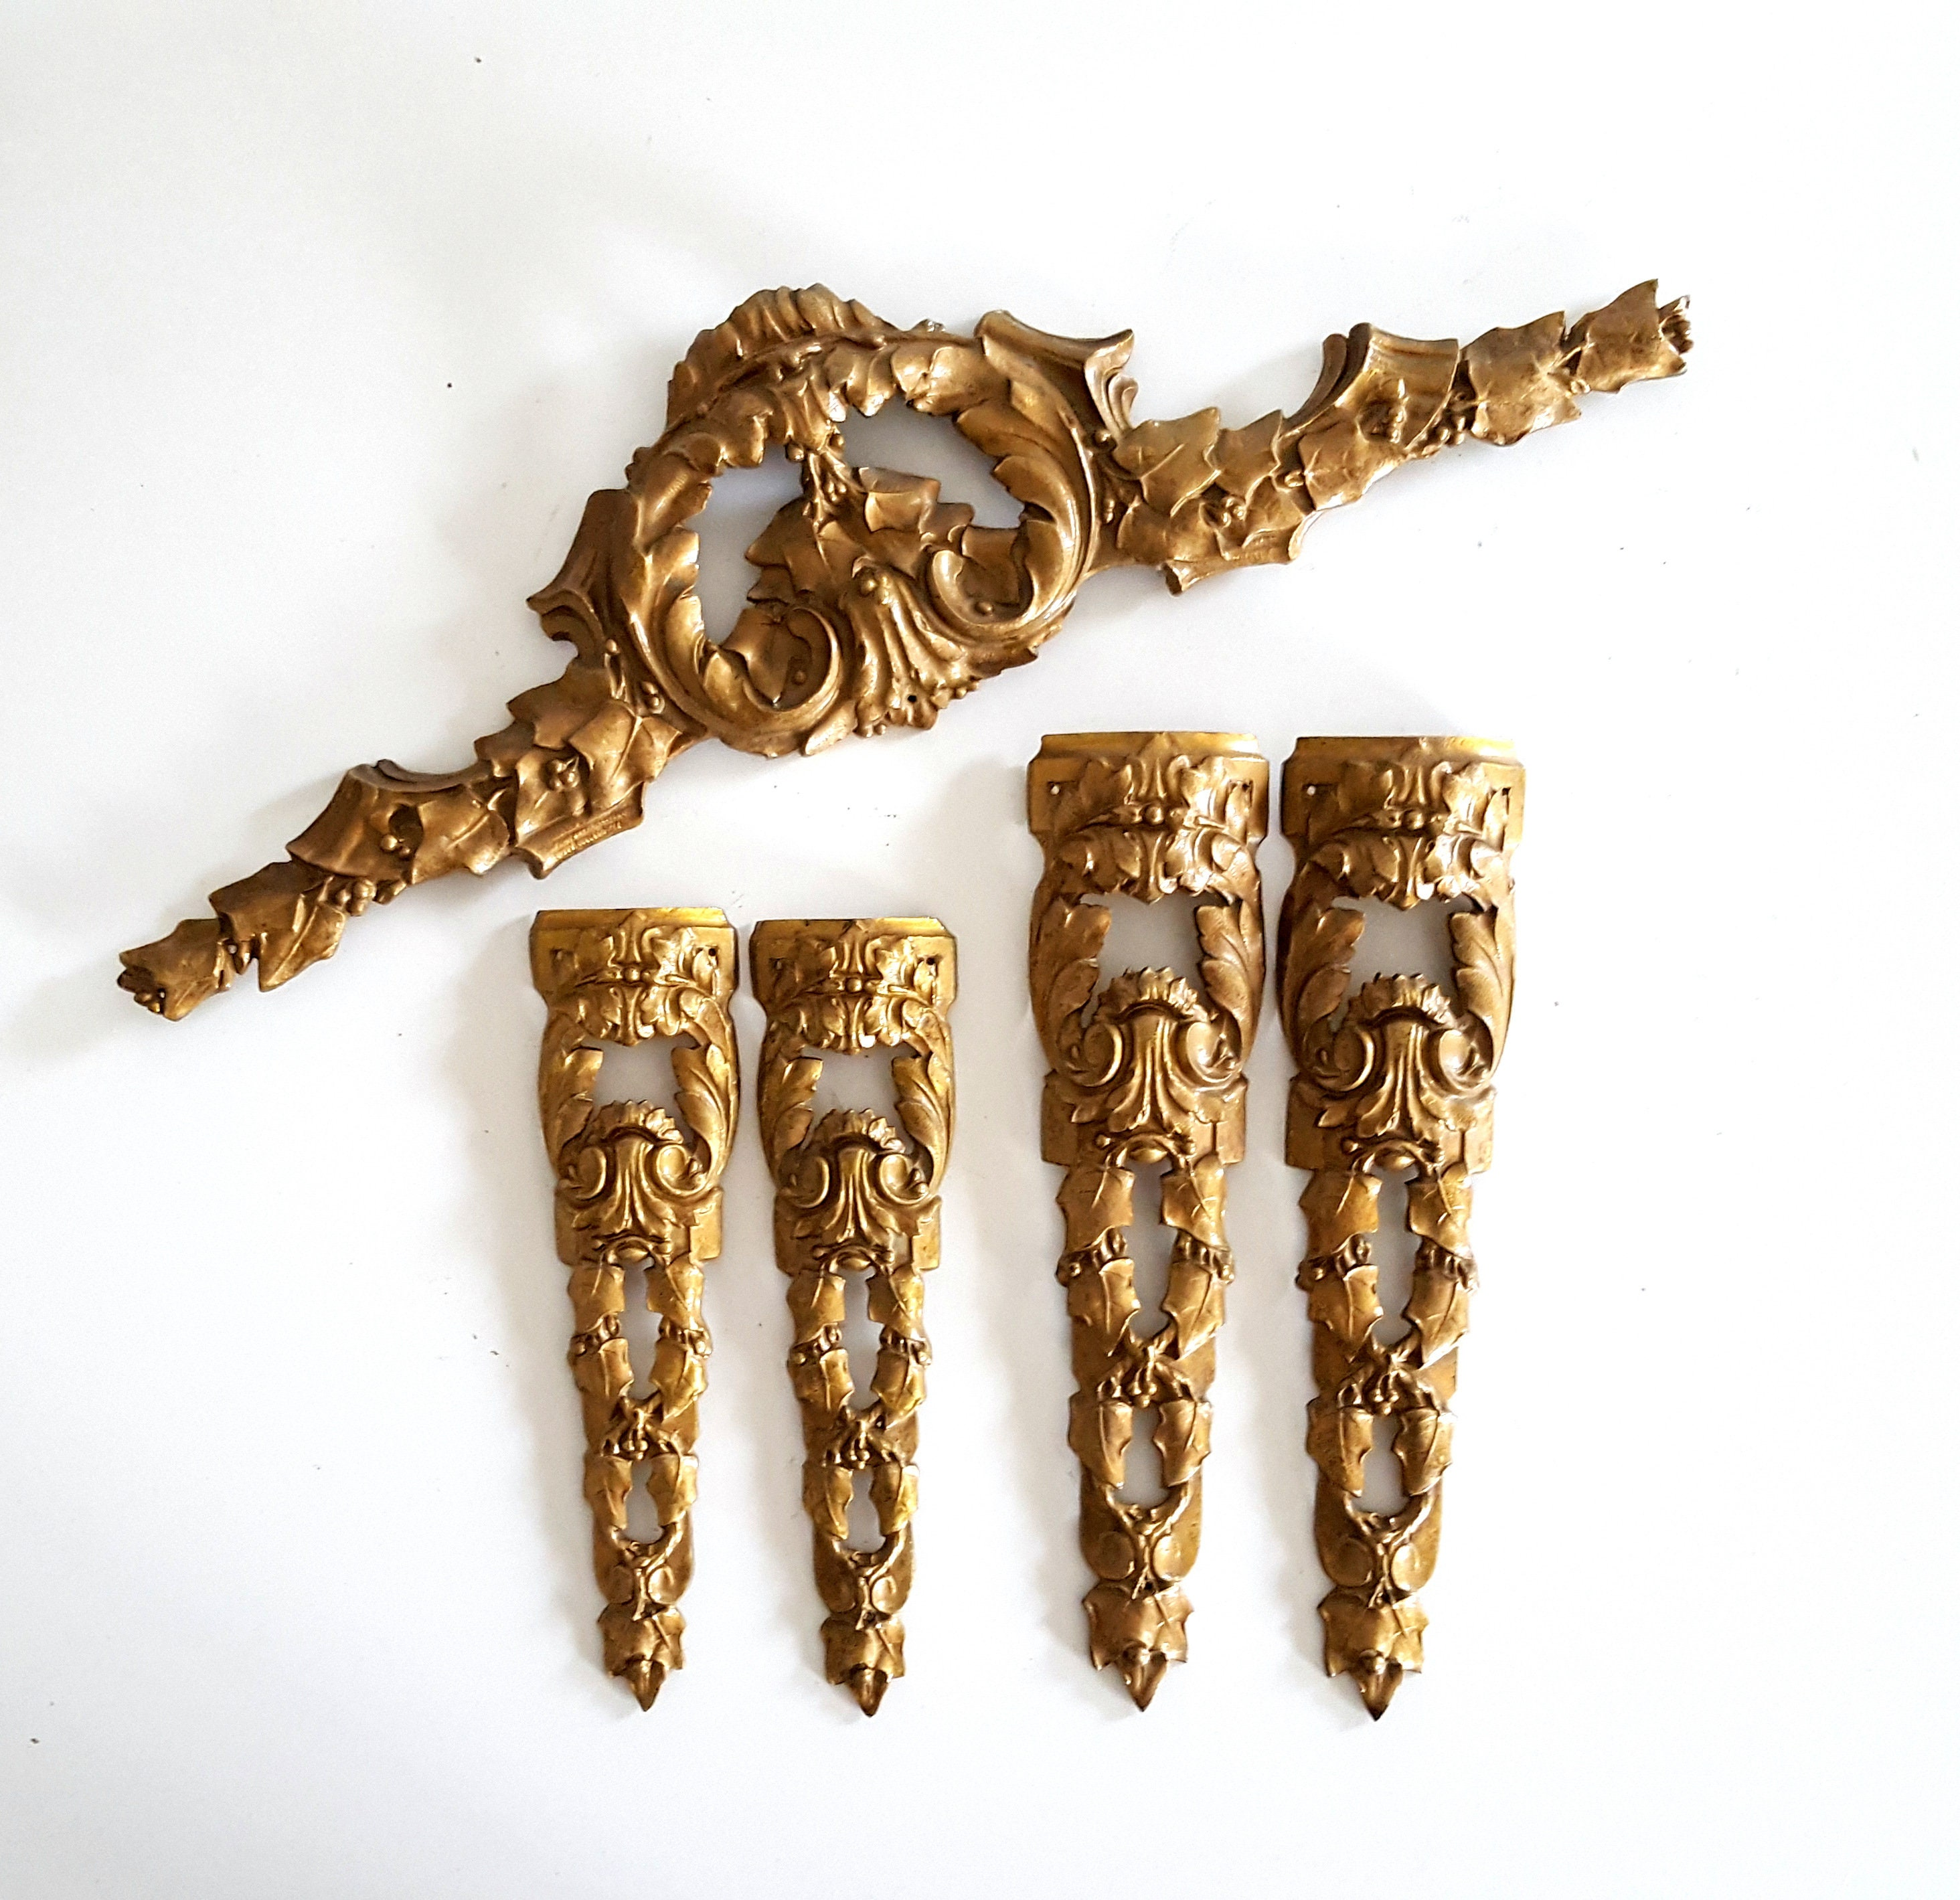 Antique French Cherub Crown Furniture Mount Embellishment Pediment Ornament